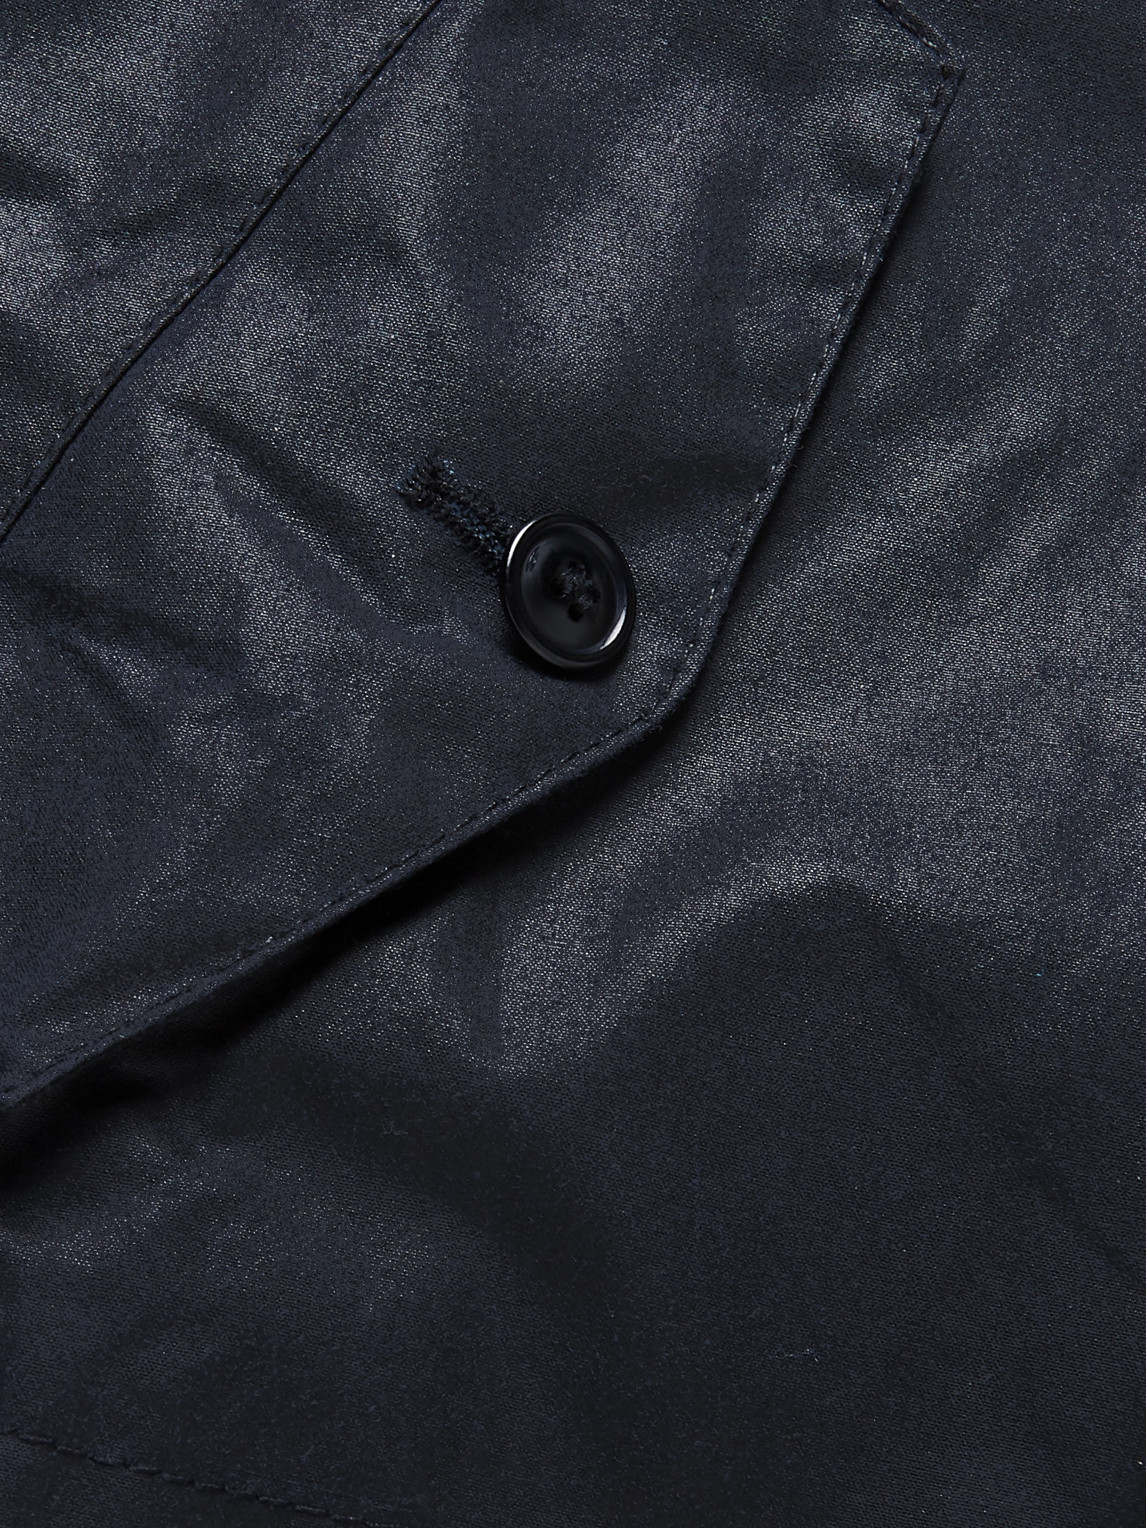 Barbour White Label - White Label Endurance Hooded Corduroy-trimmed Waxed-cotton Jacket - Blue - M - Men